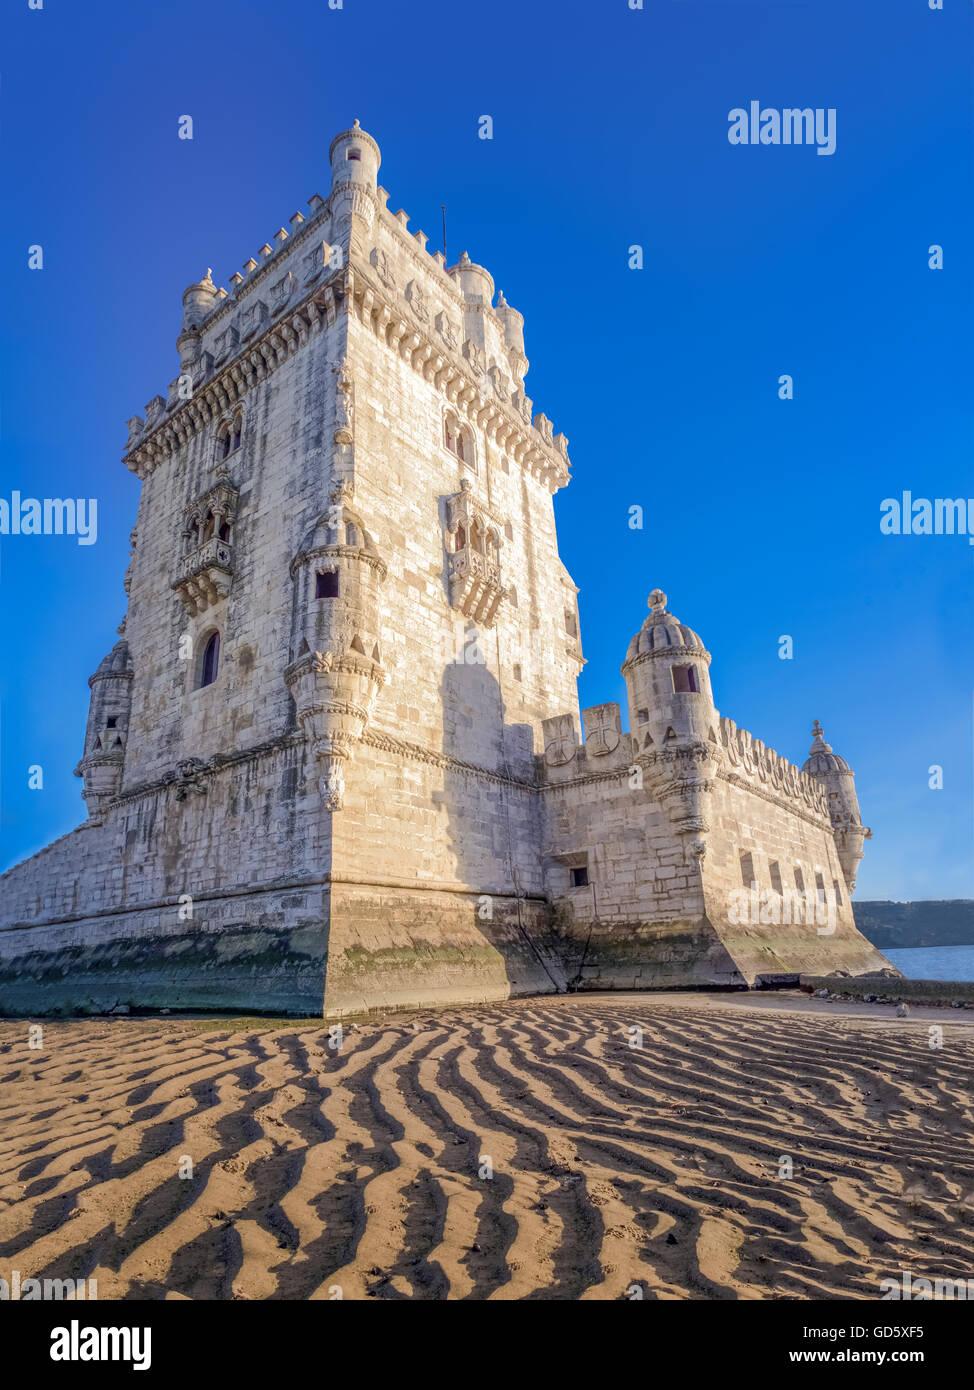 Belem Tower (Torre de Belem, Manueline style, Portuguese late gothic). A UNESCO World Heritage Site. Lisbon, Portugal - Stock Image